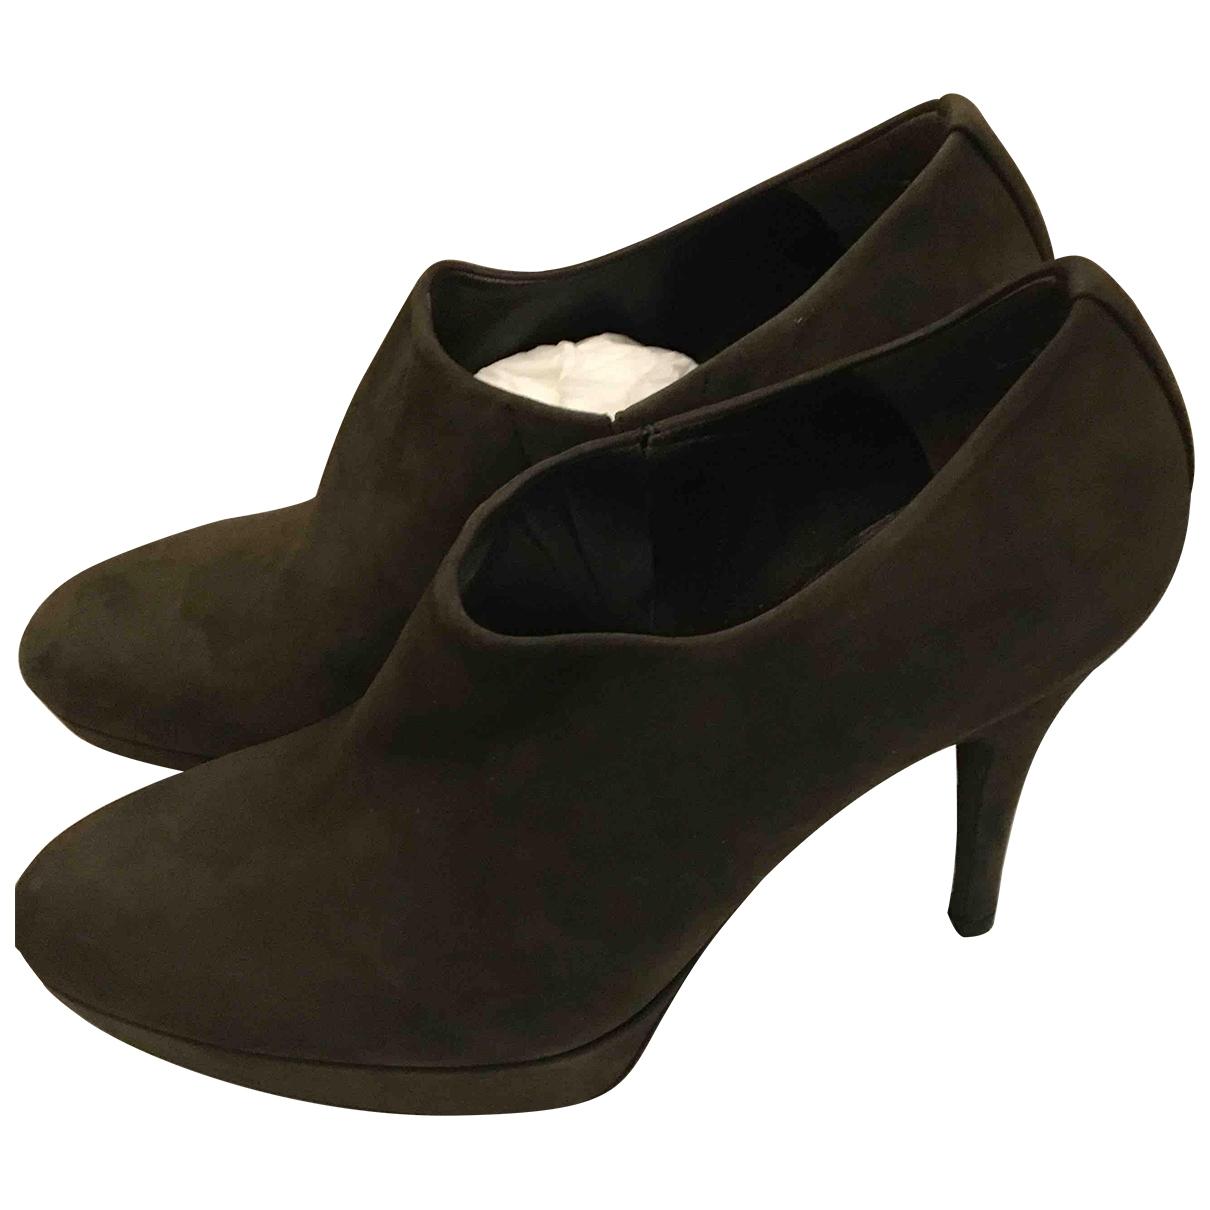 Stuart Weitzman \N Suede Ankle boots for Women 38.5 EU